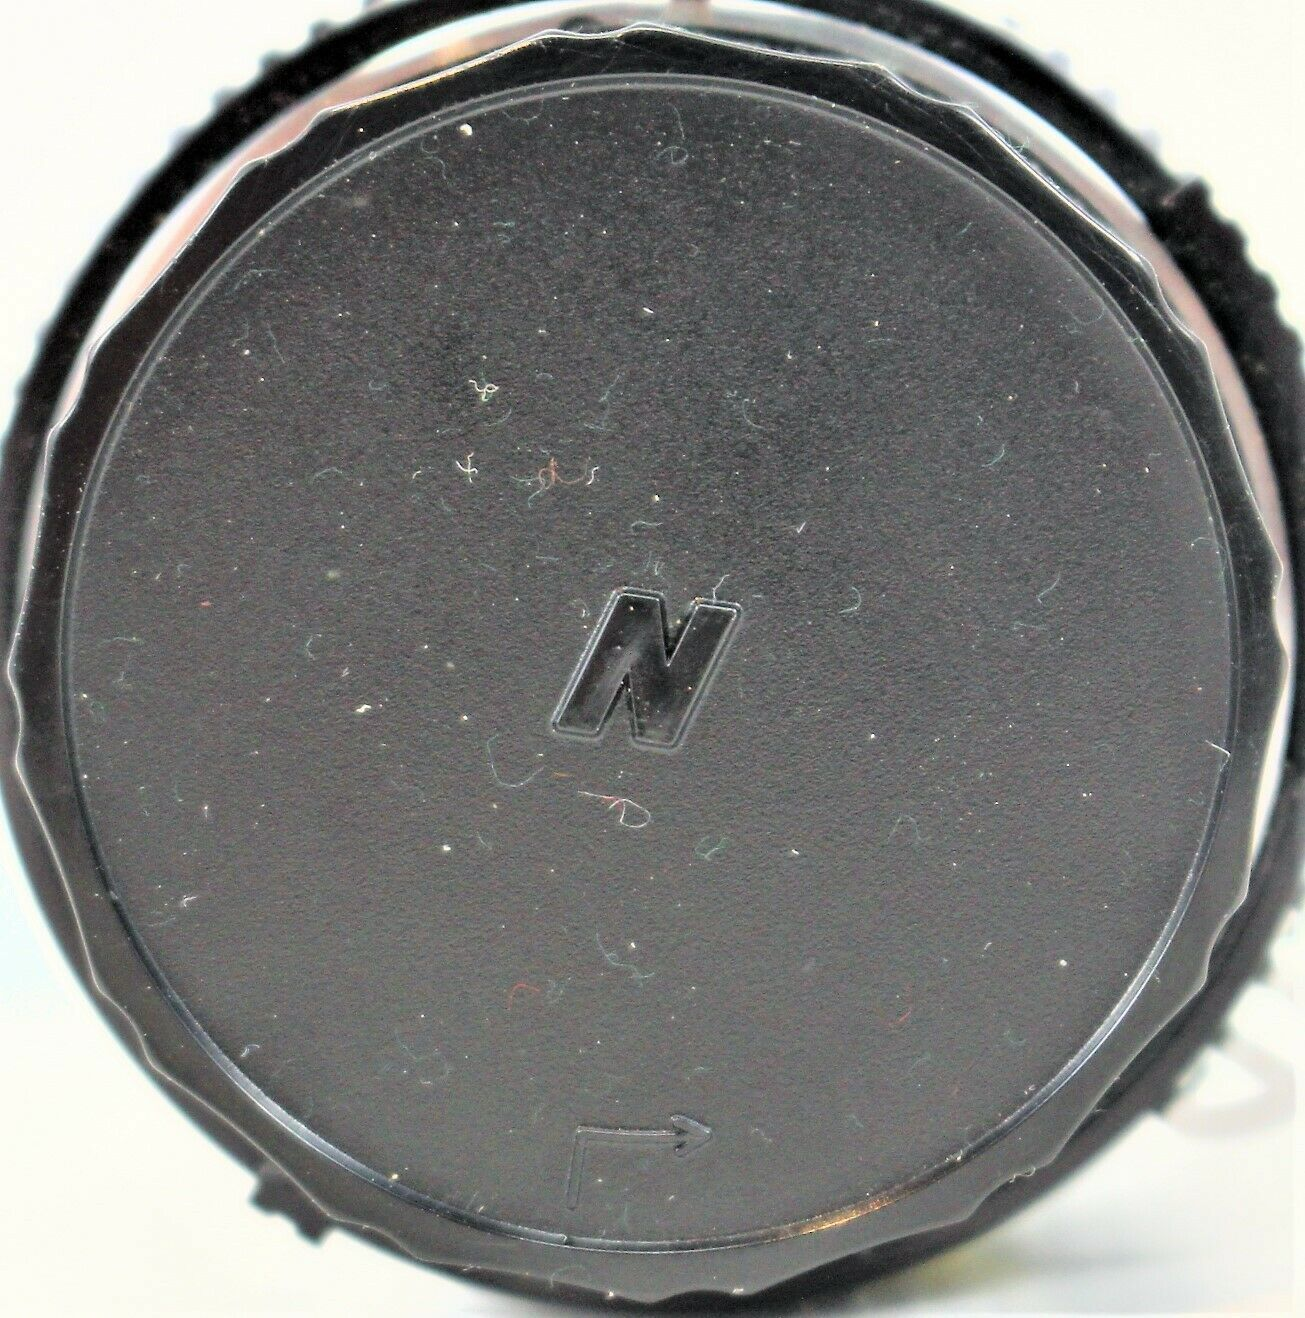 Tamron Multi C F 1:2.8 135mm Camera Lens for Nikon AI With Soft Case image 6